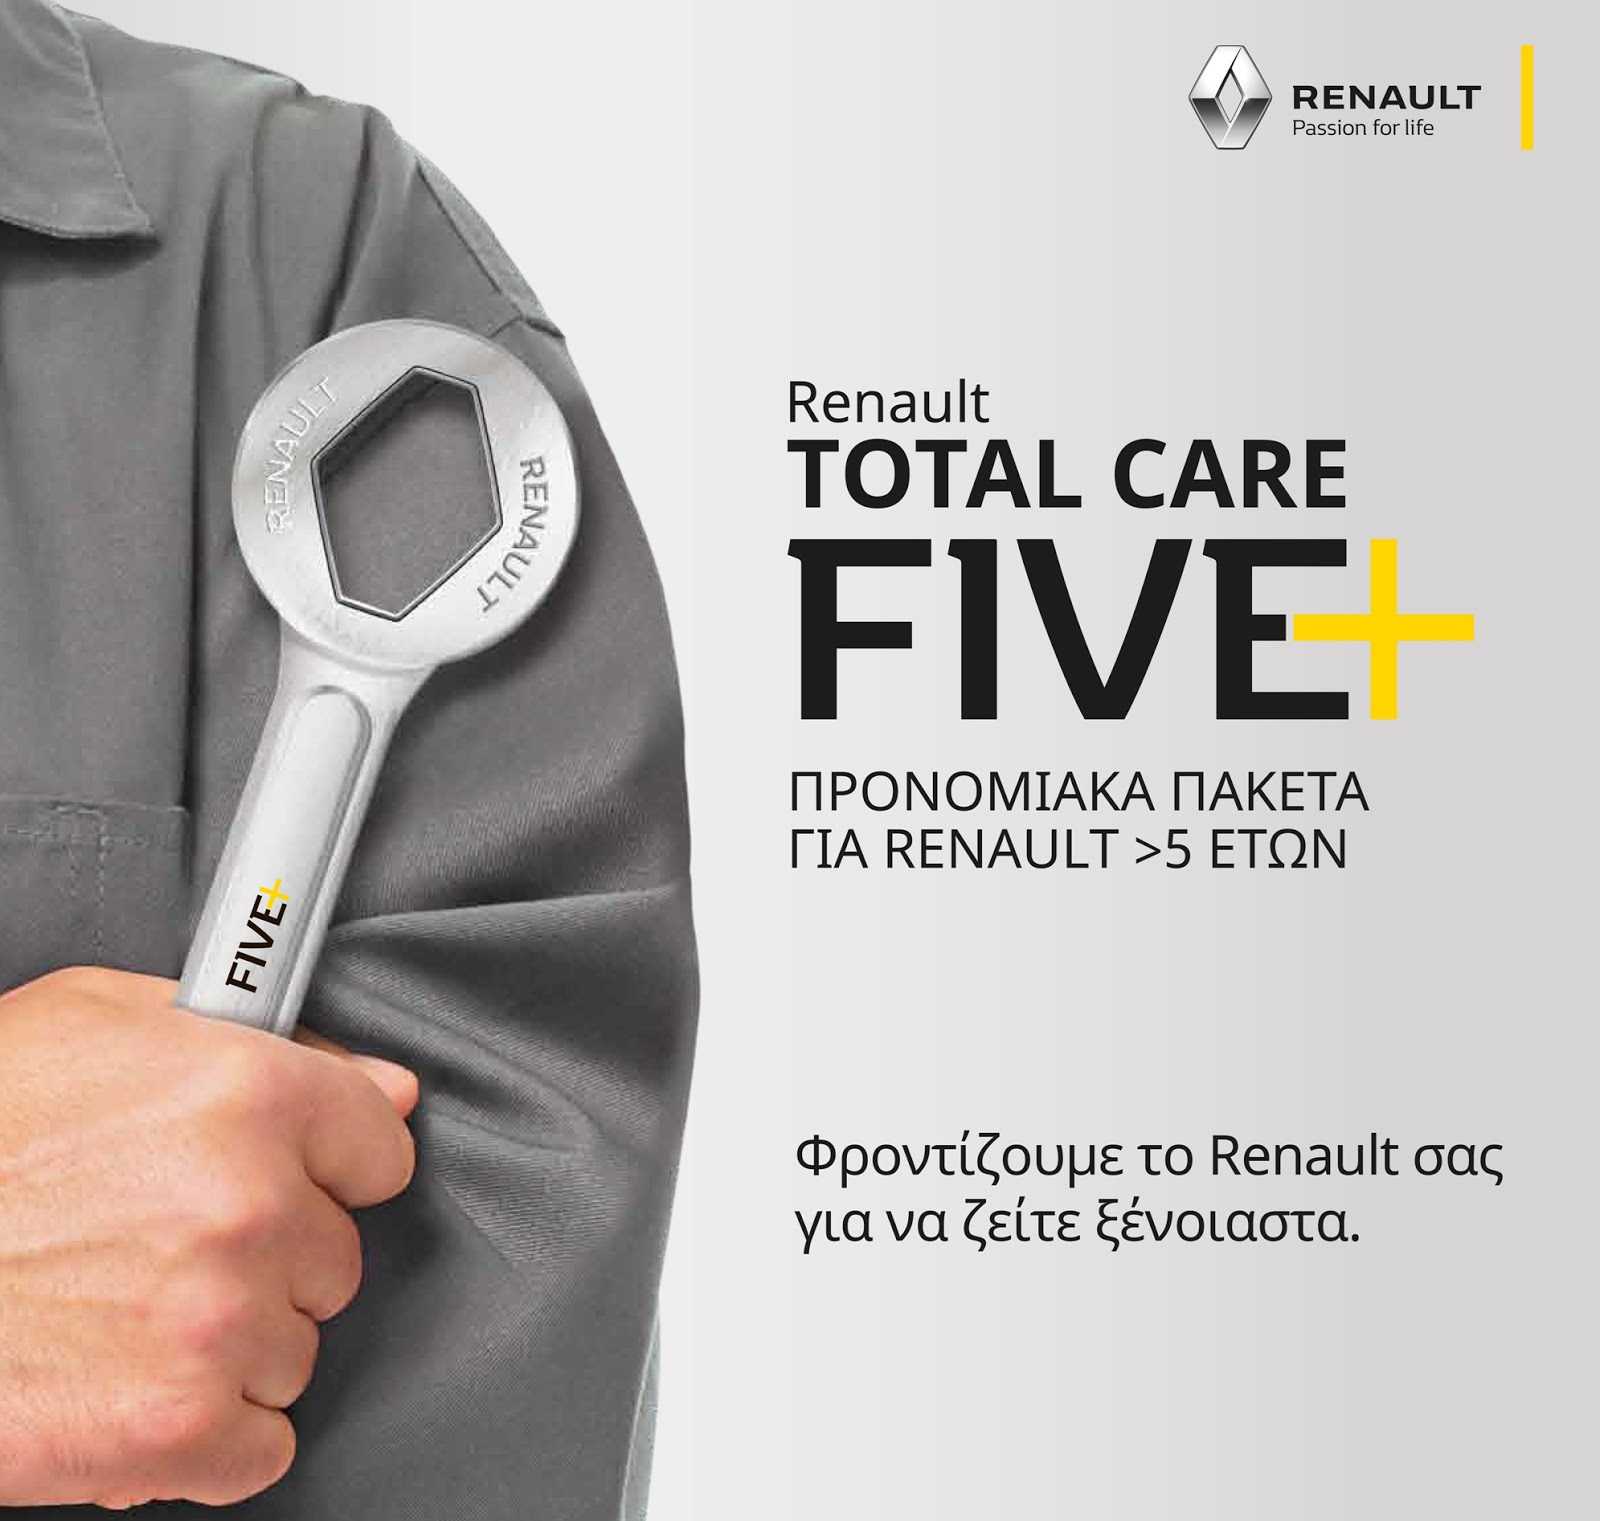 renault2Btotal2Bcare2B5252BL Ειδικές προνομιακές τιμές για τη συντήρηση του αγαπημένου σας Renault, ηλικίας άνω των 5 ετών